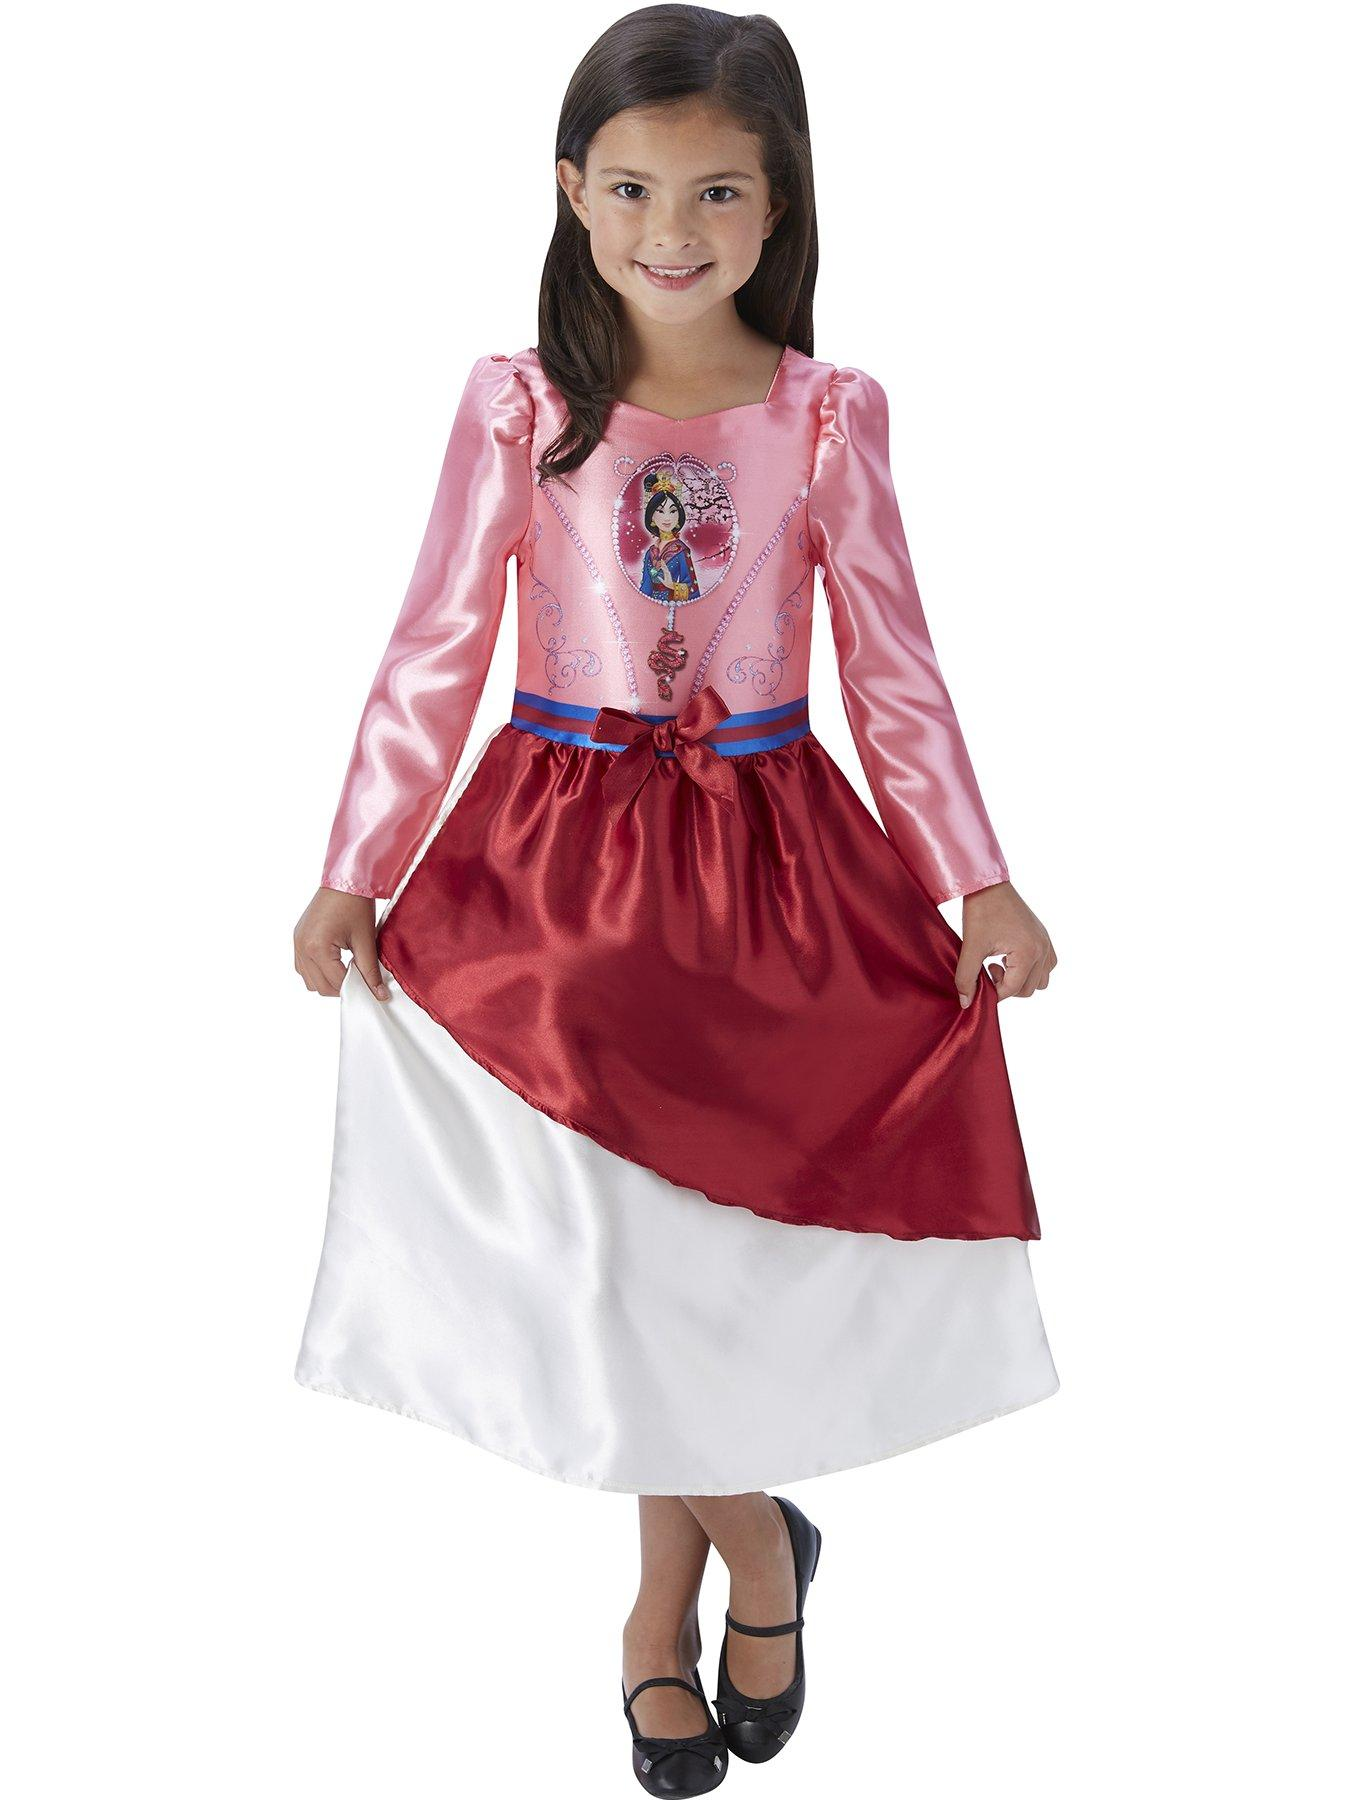 Disney Princess ~ Tiana storytime Kids Costume 3-4 Years